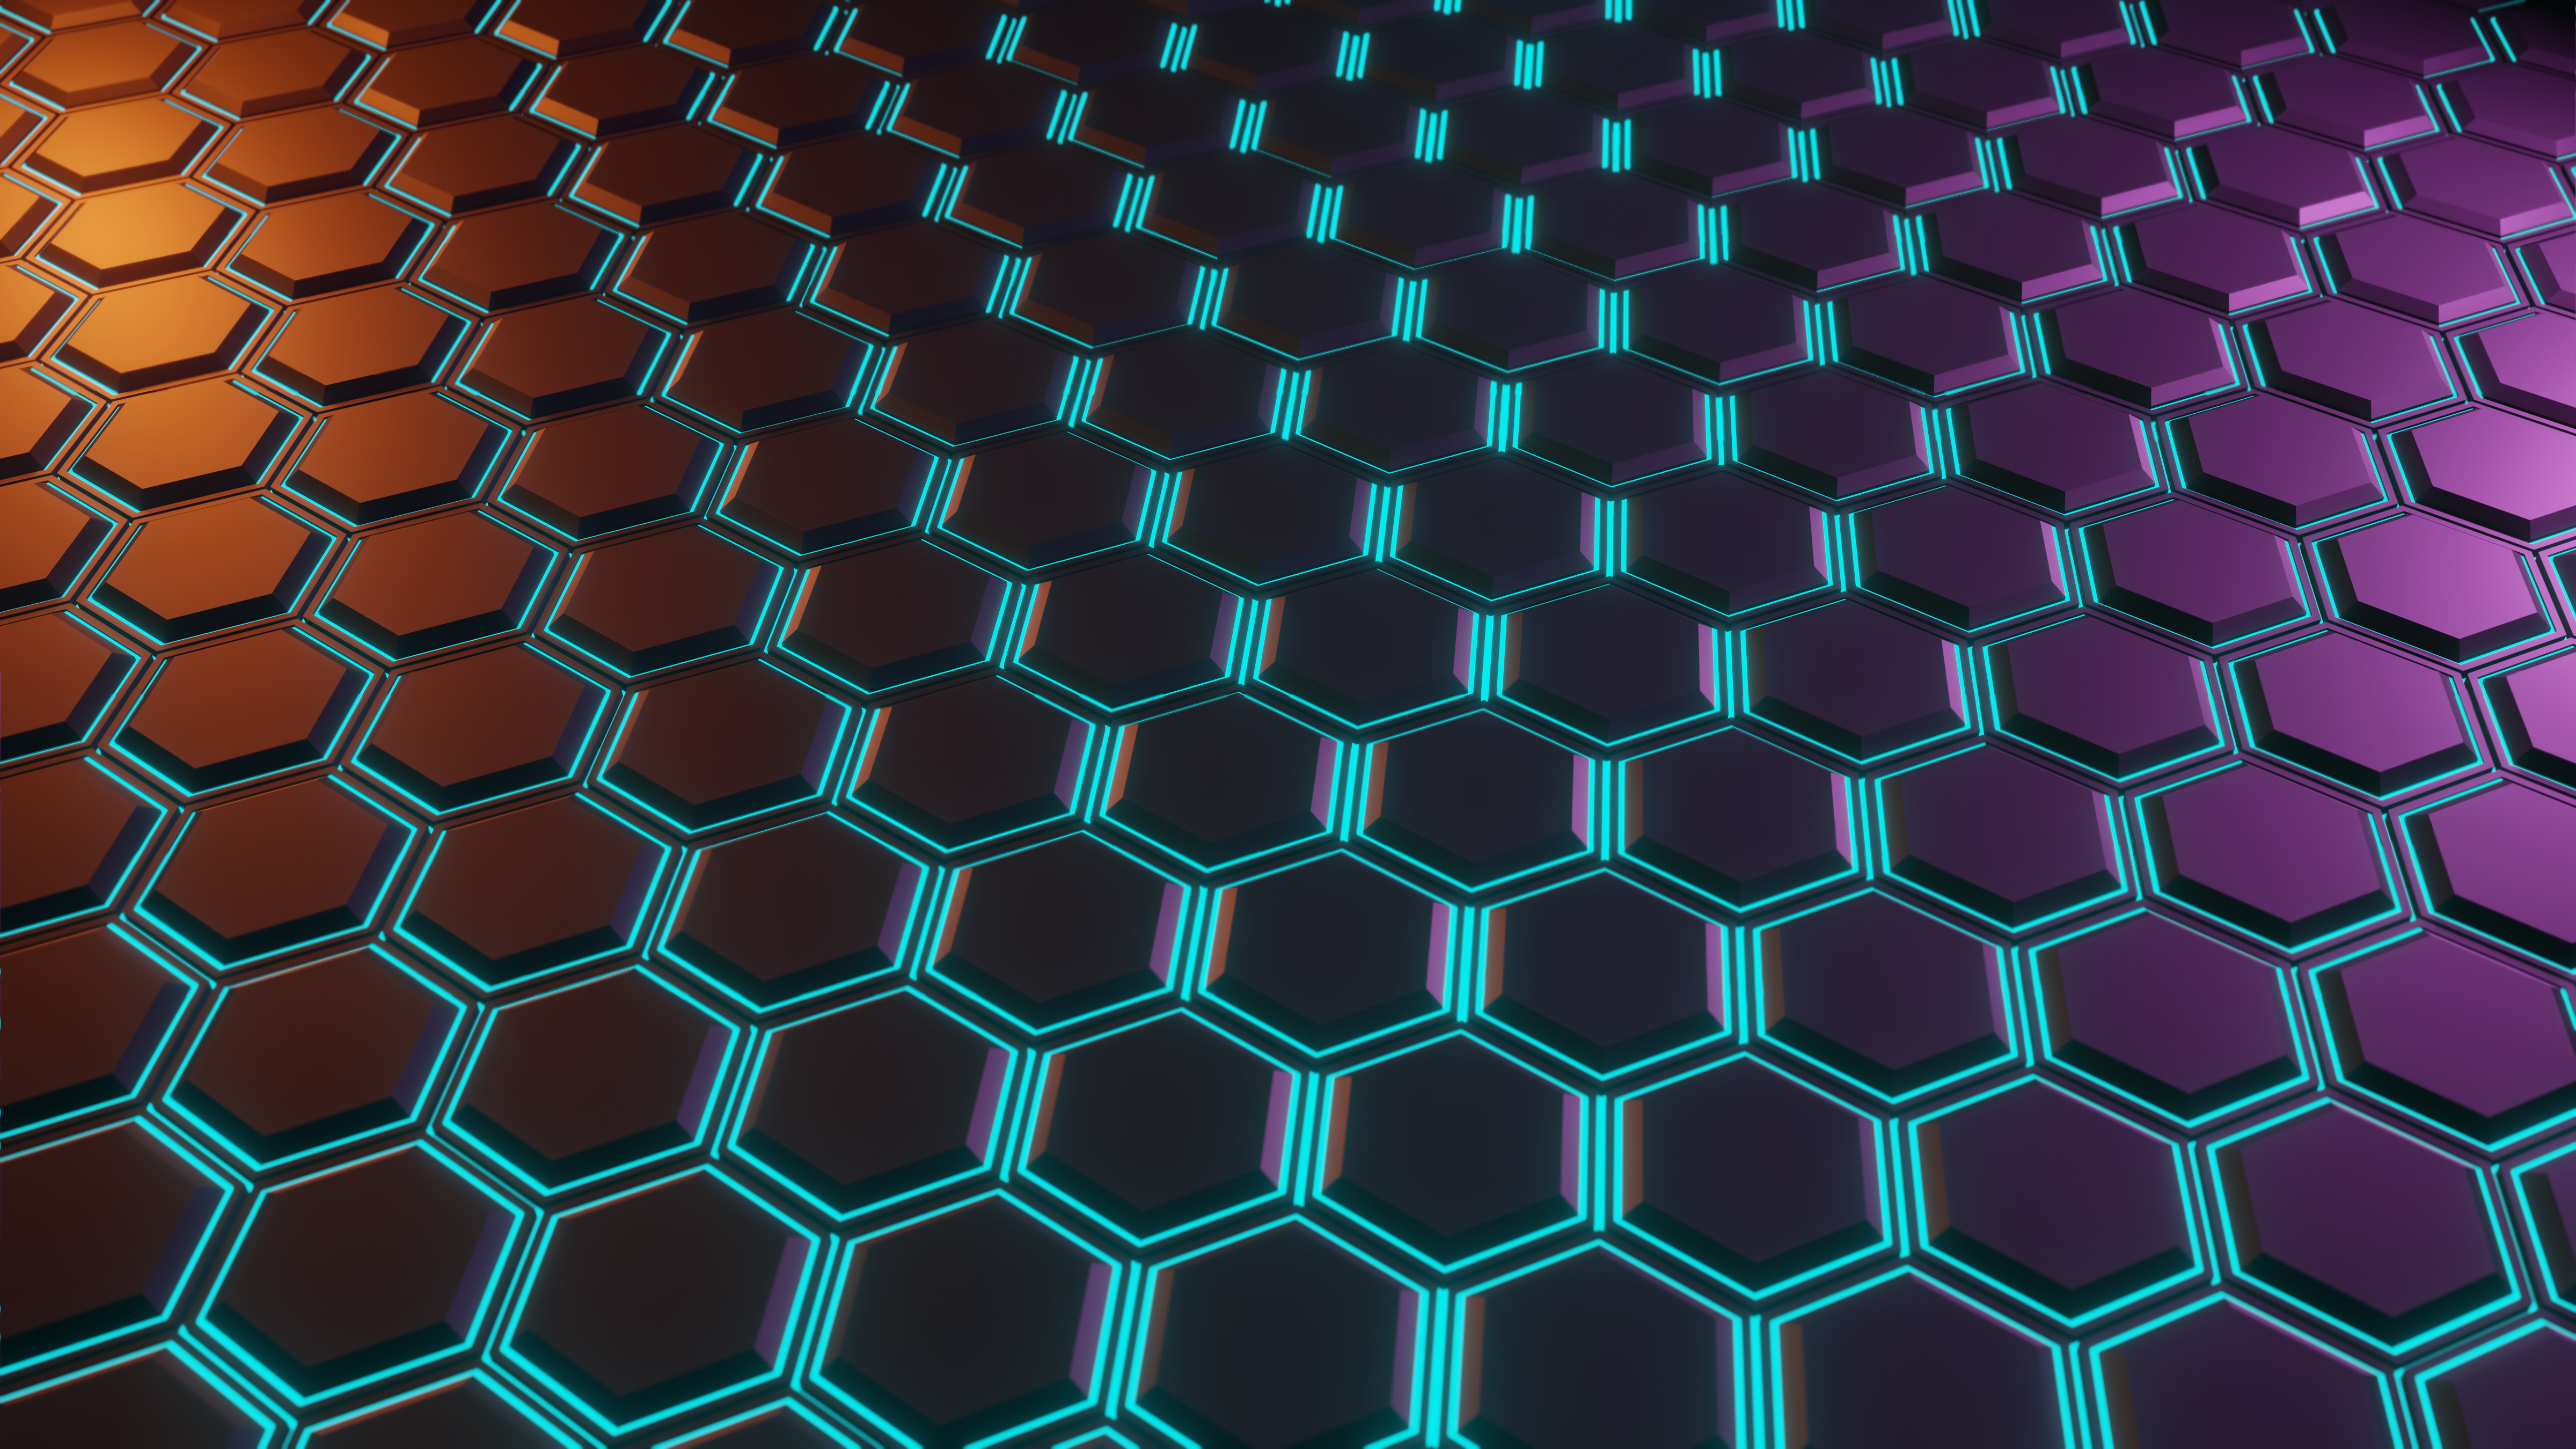 Hexagon Pattern 4800x2700